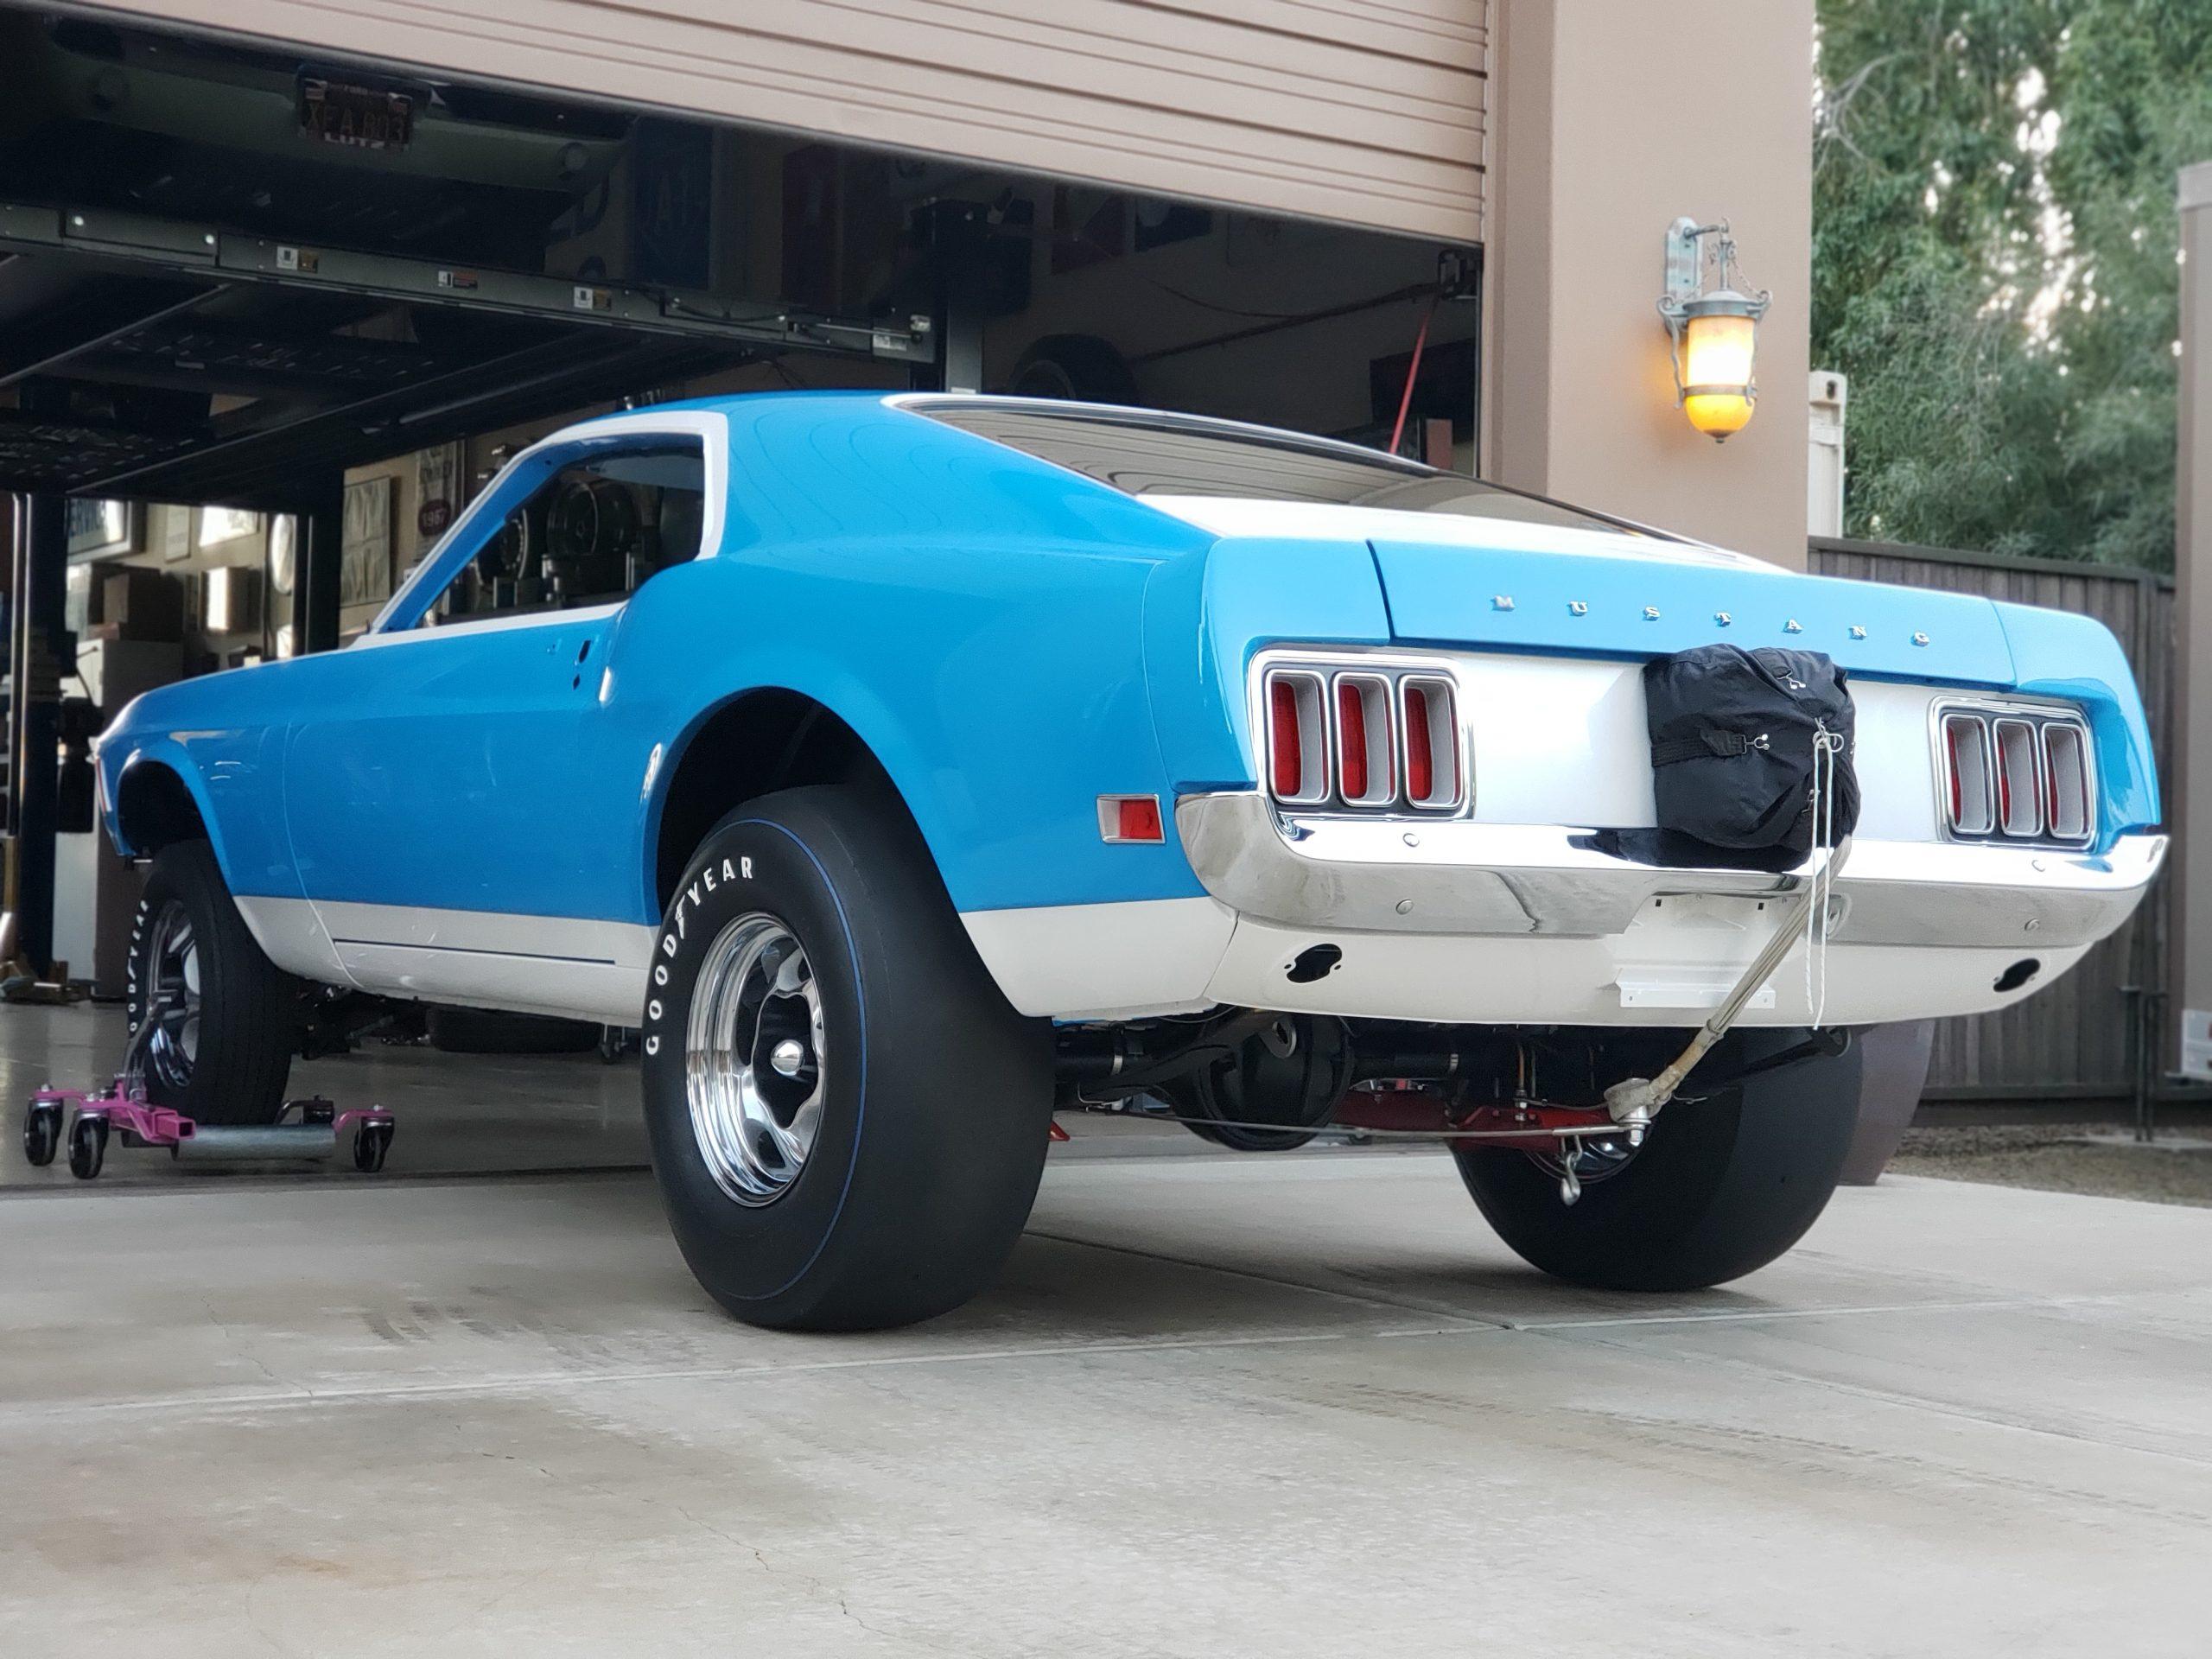 Lawman Boss 429 Ford Mustang restoration rear three-quarter outside garage